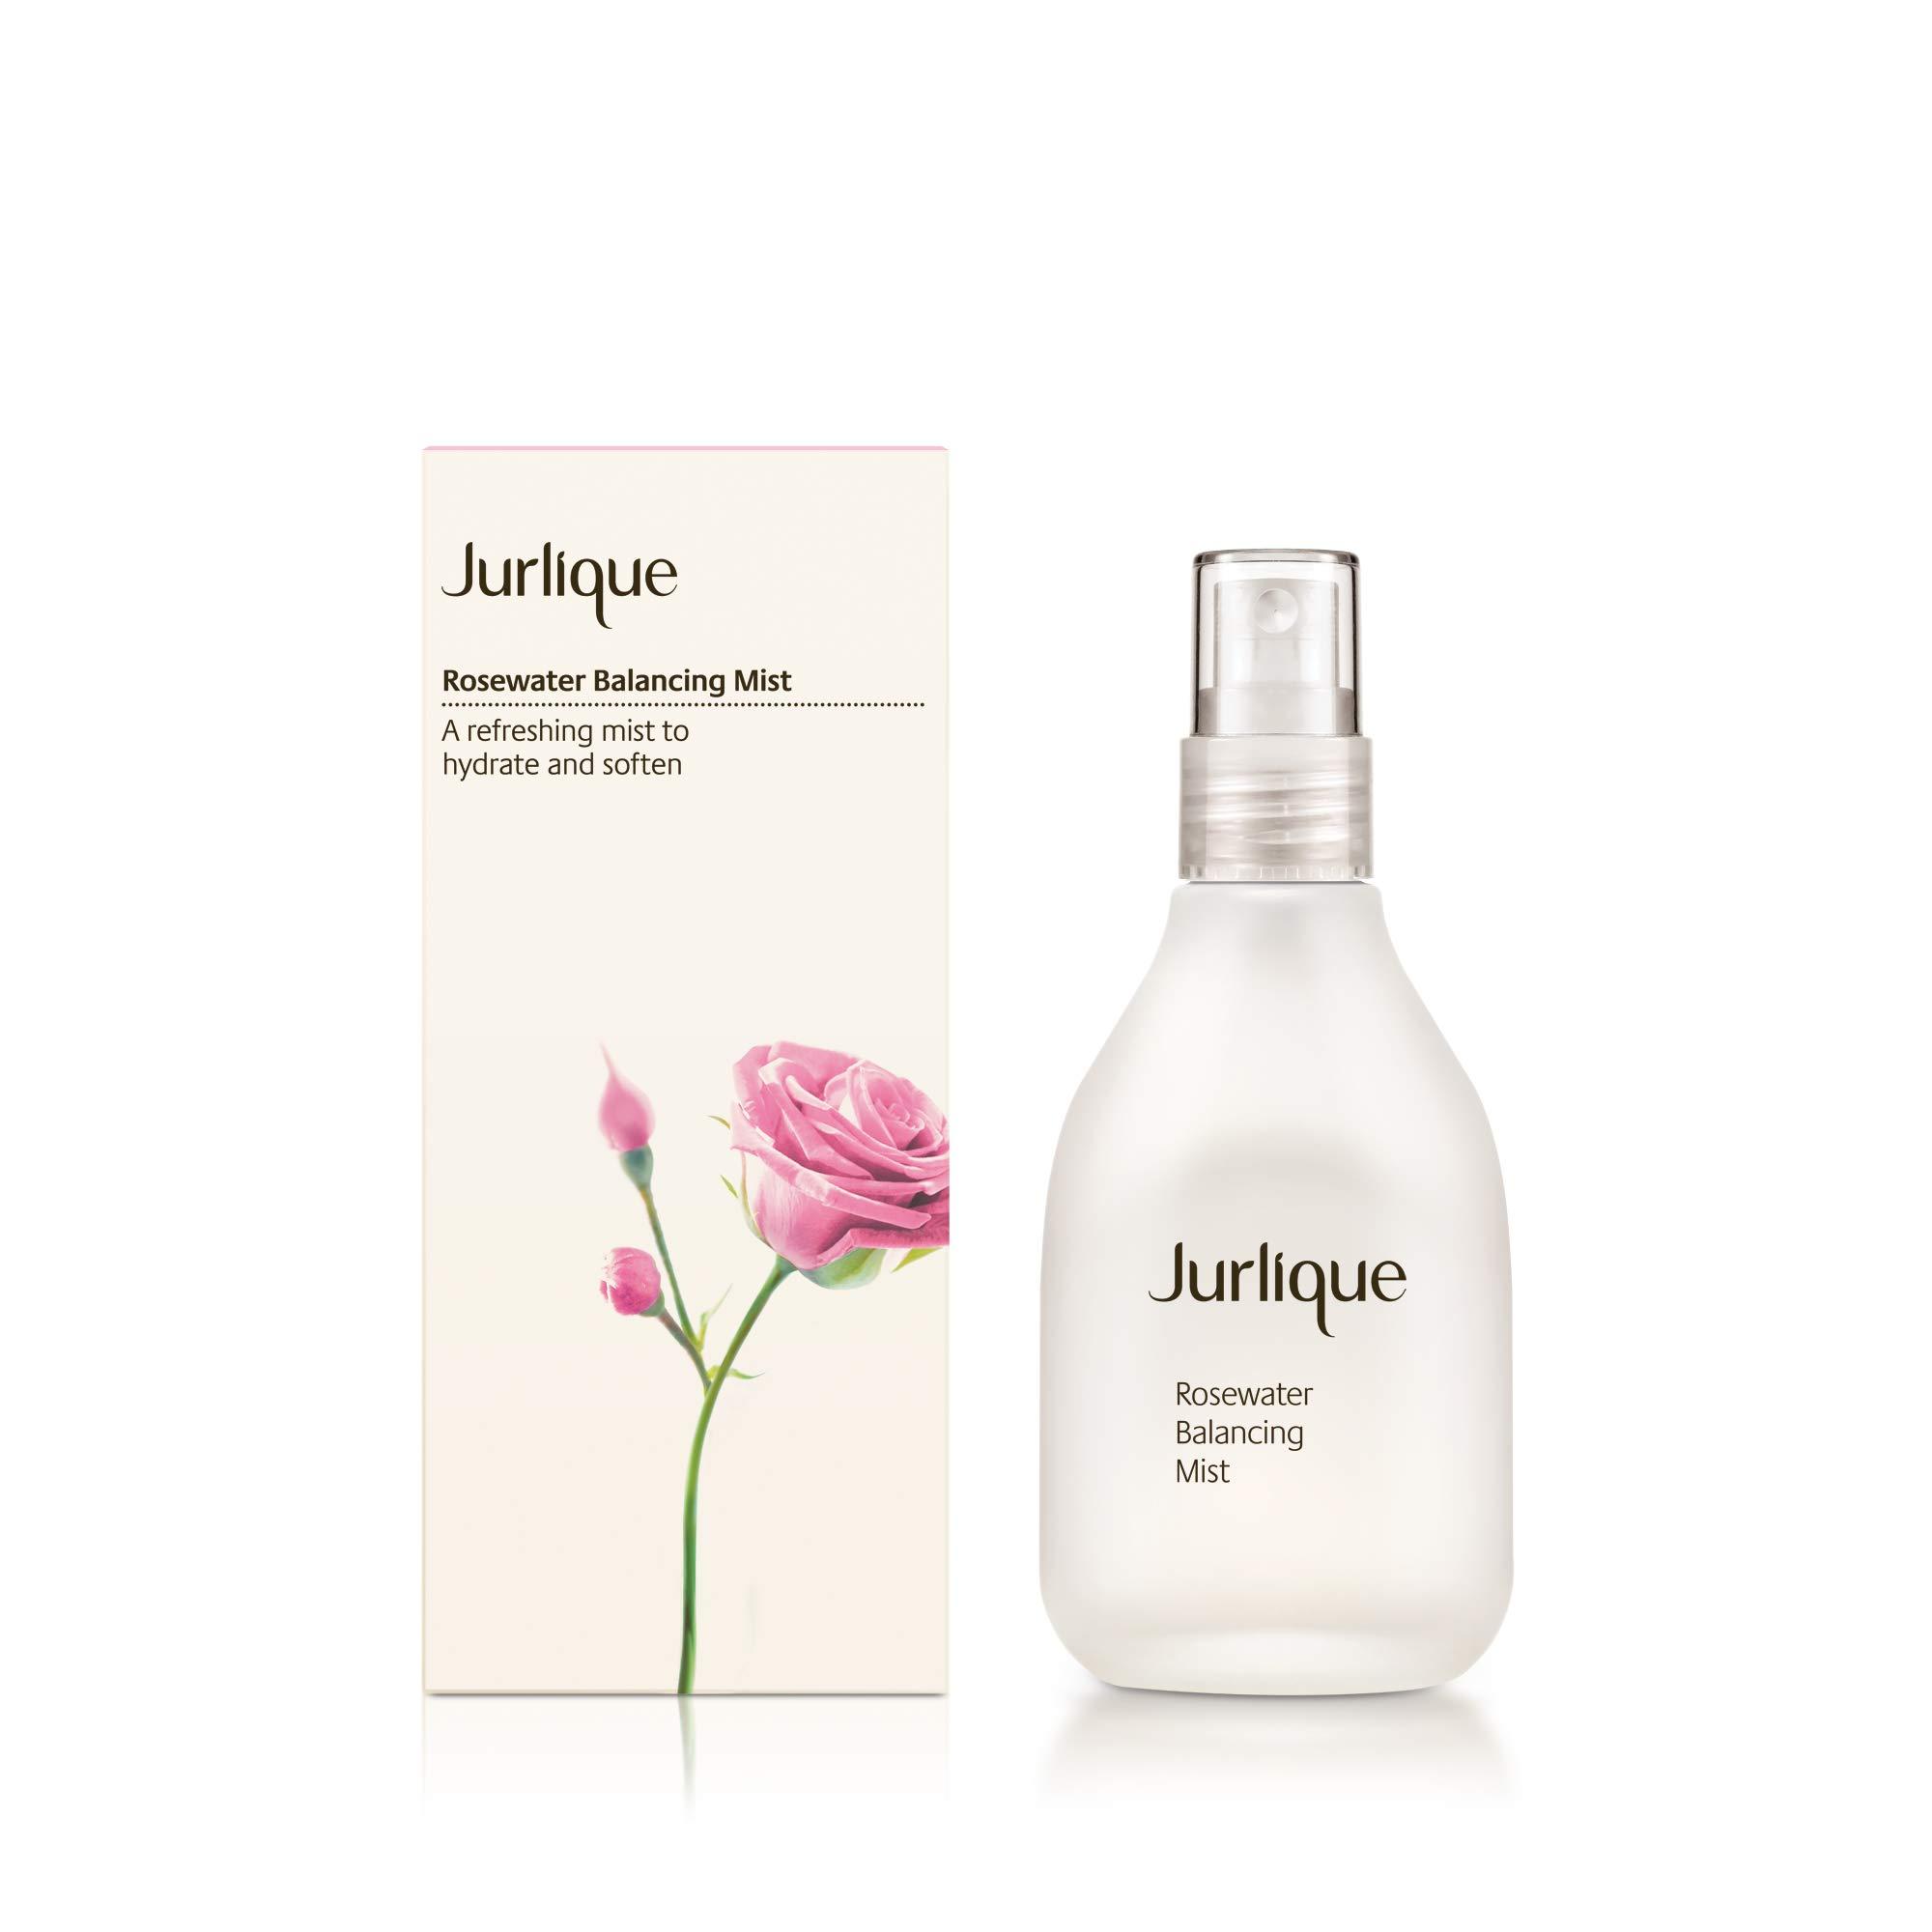 Jurlique Rosewater Balancing Mist, 3.3 Fl Oz by Jurlique